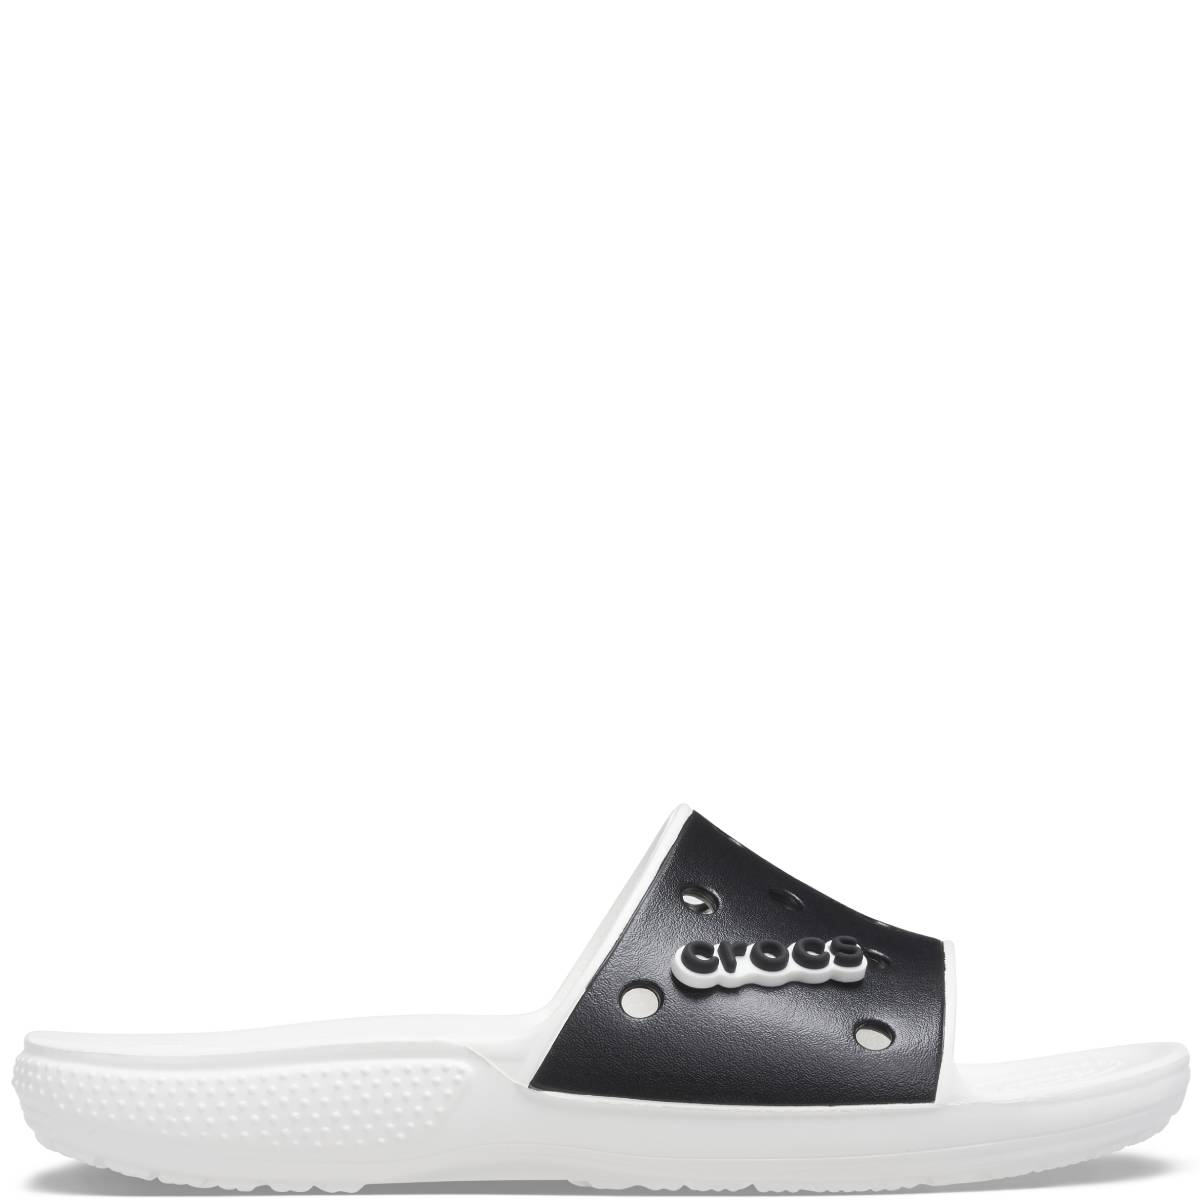 Classic Crocs Colorblock Slide - Beyaz Siyah